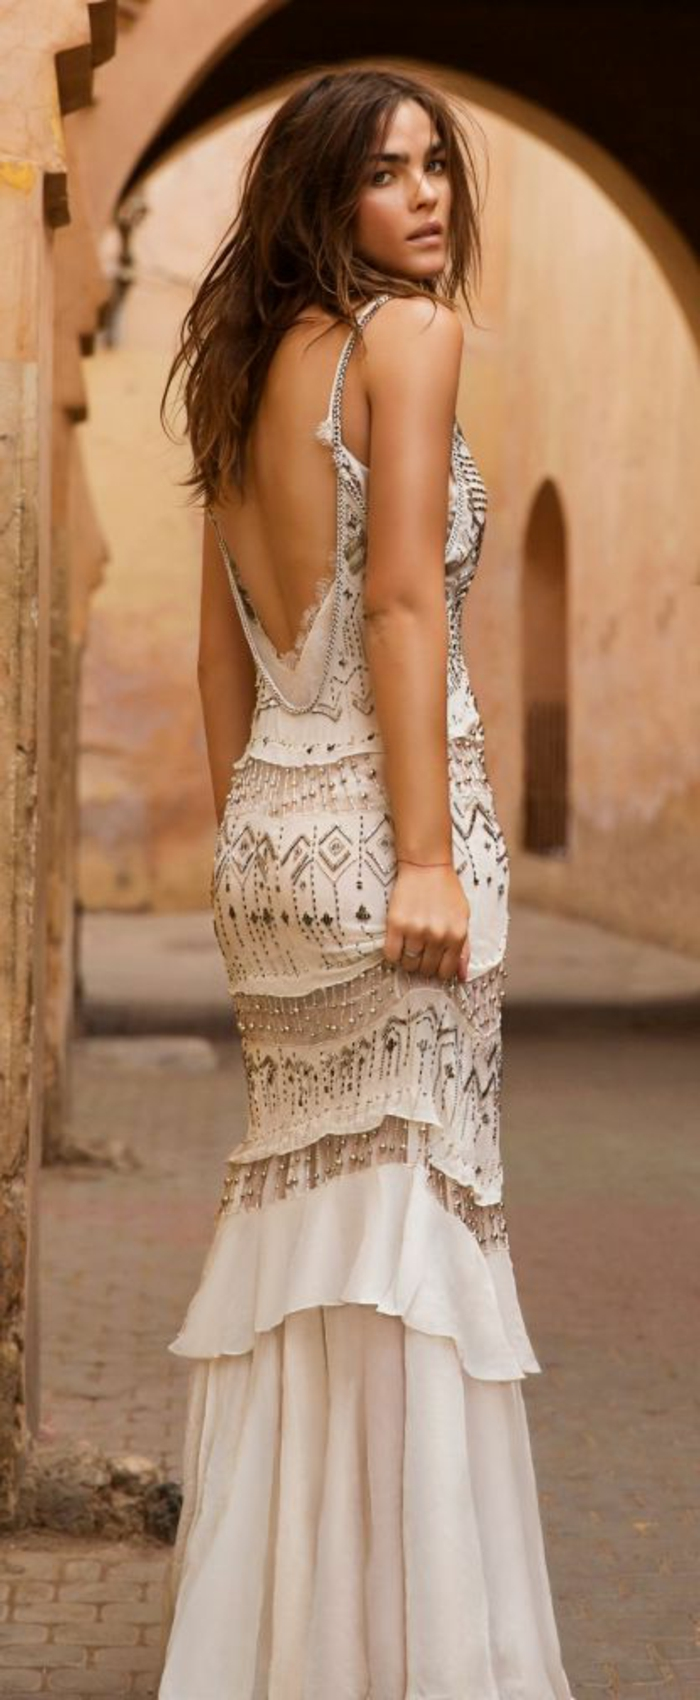 elegantes-langes-Kleid-glitzerne-Dekoration-schick-boho-chic